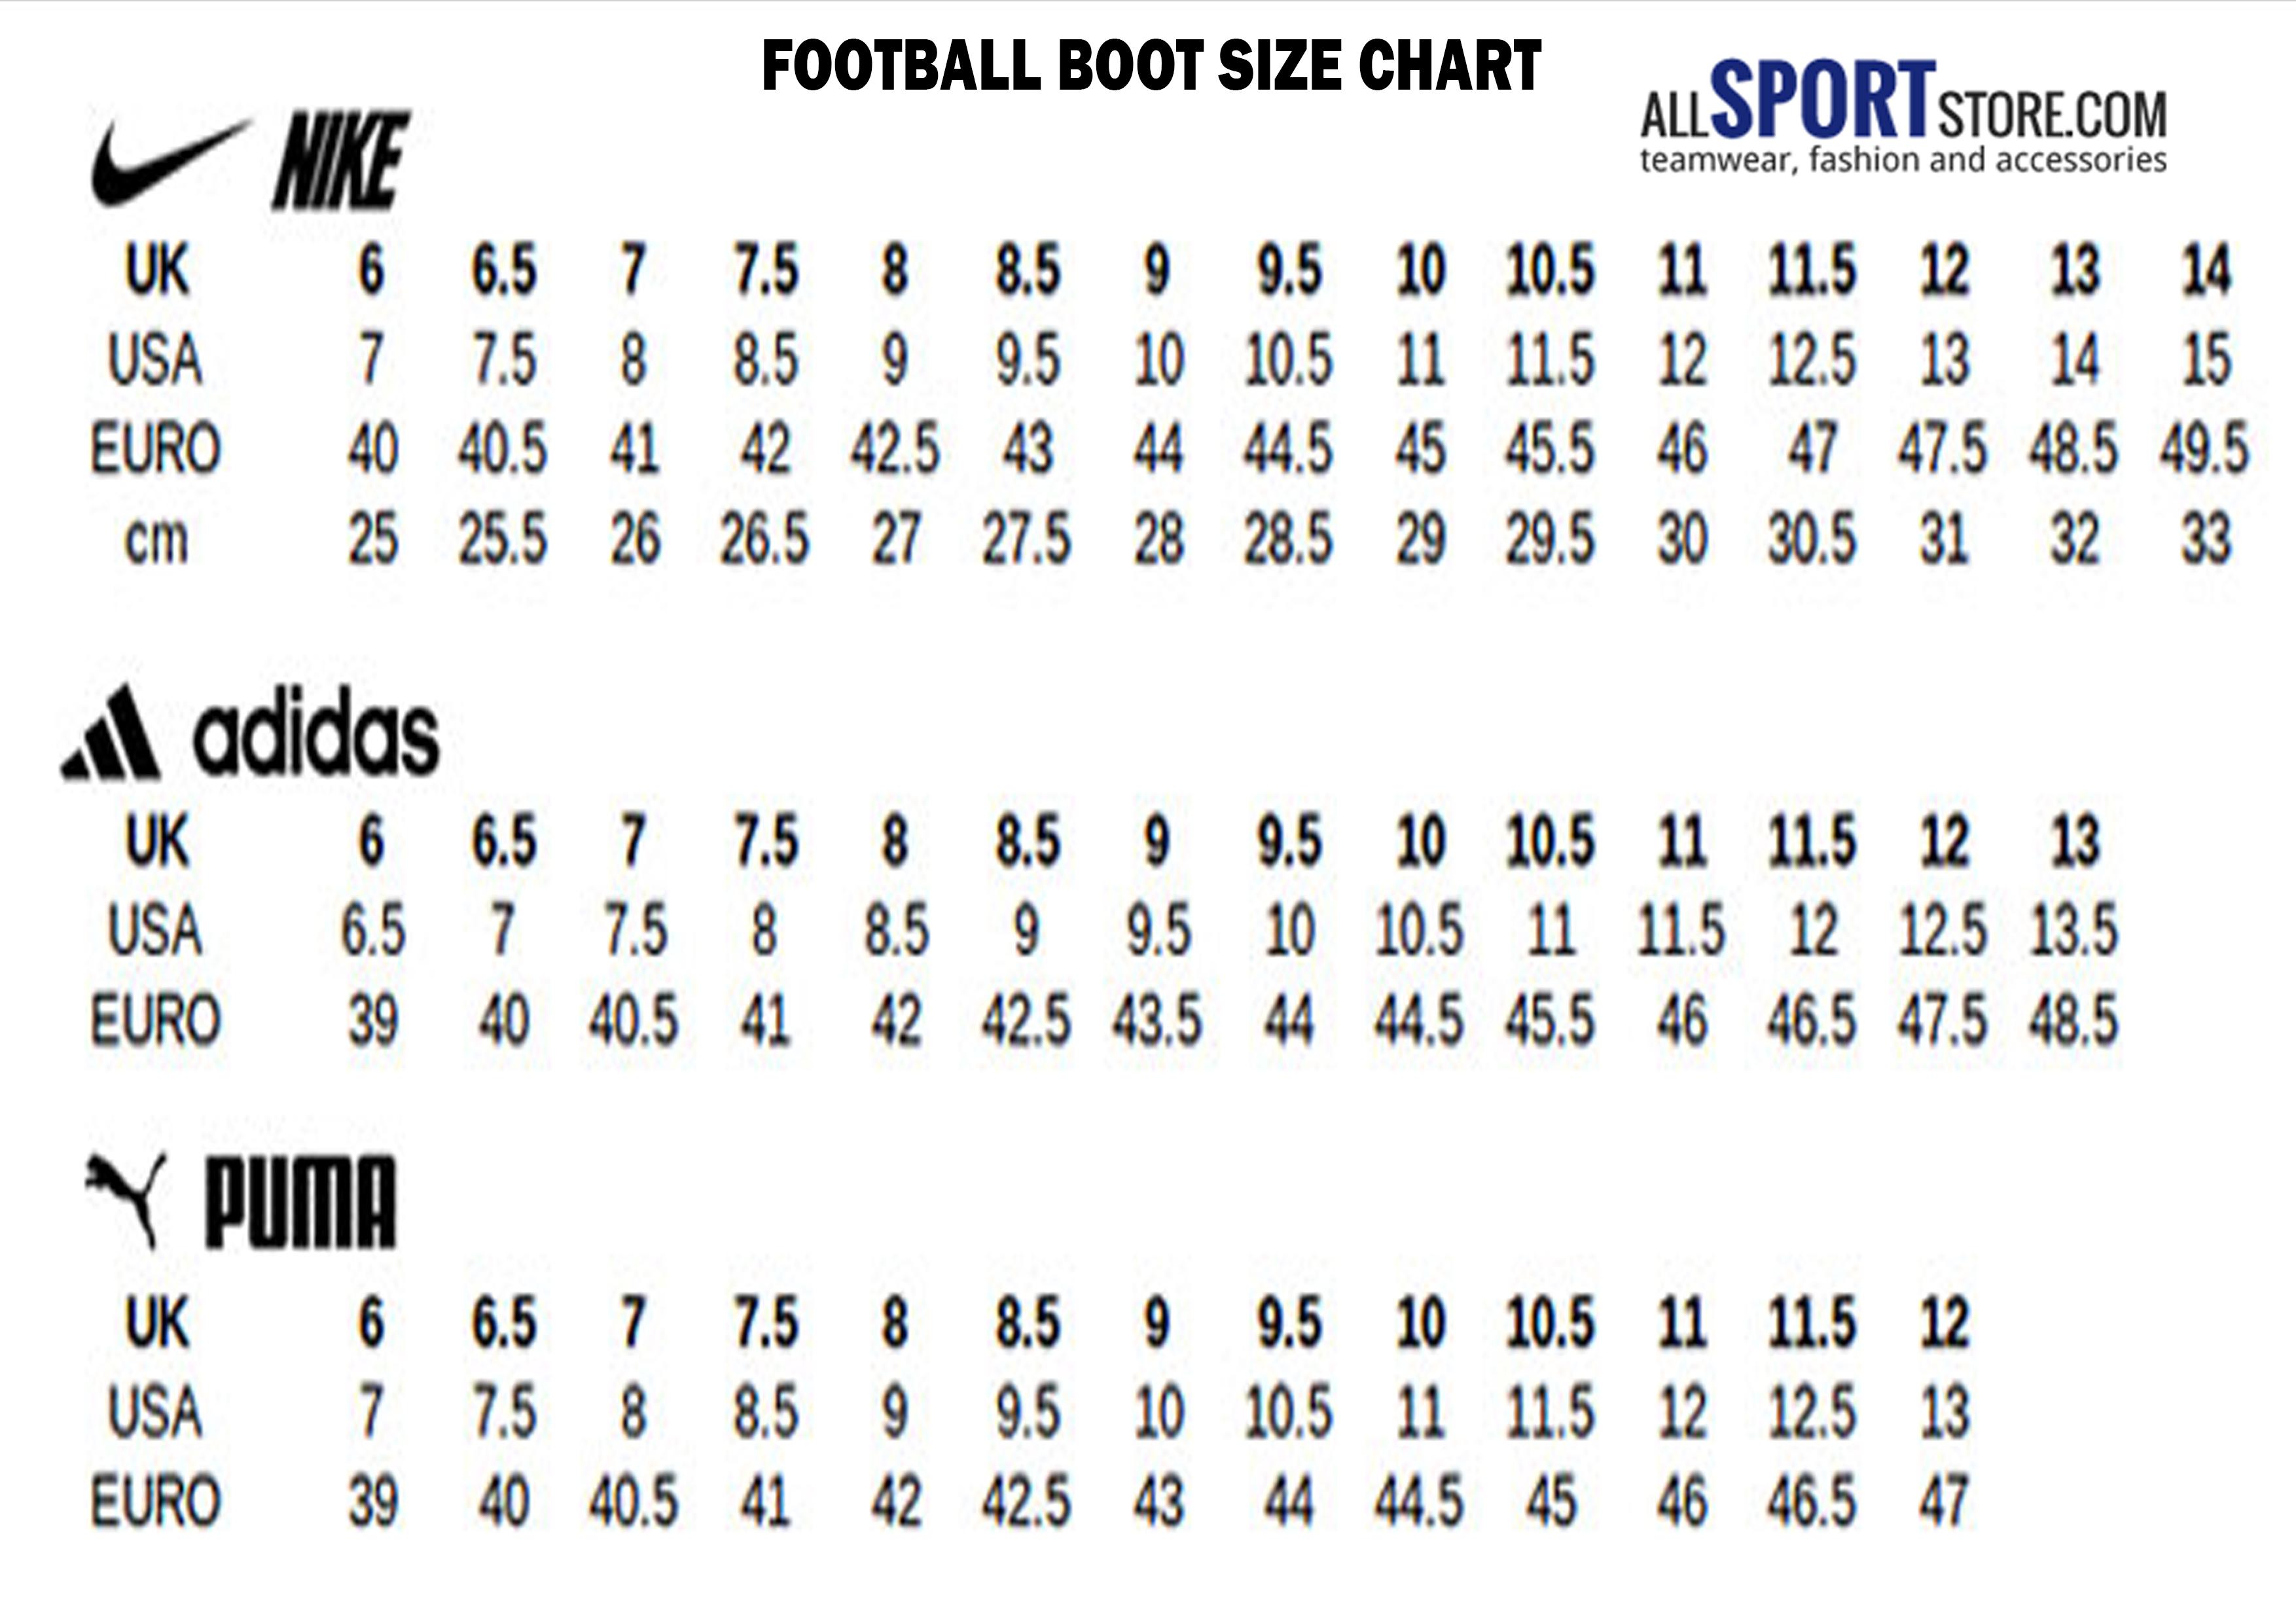 How Do Puma Shoe Sizes Compared To Nike